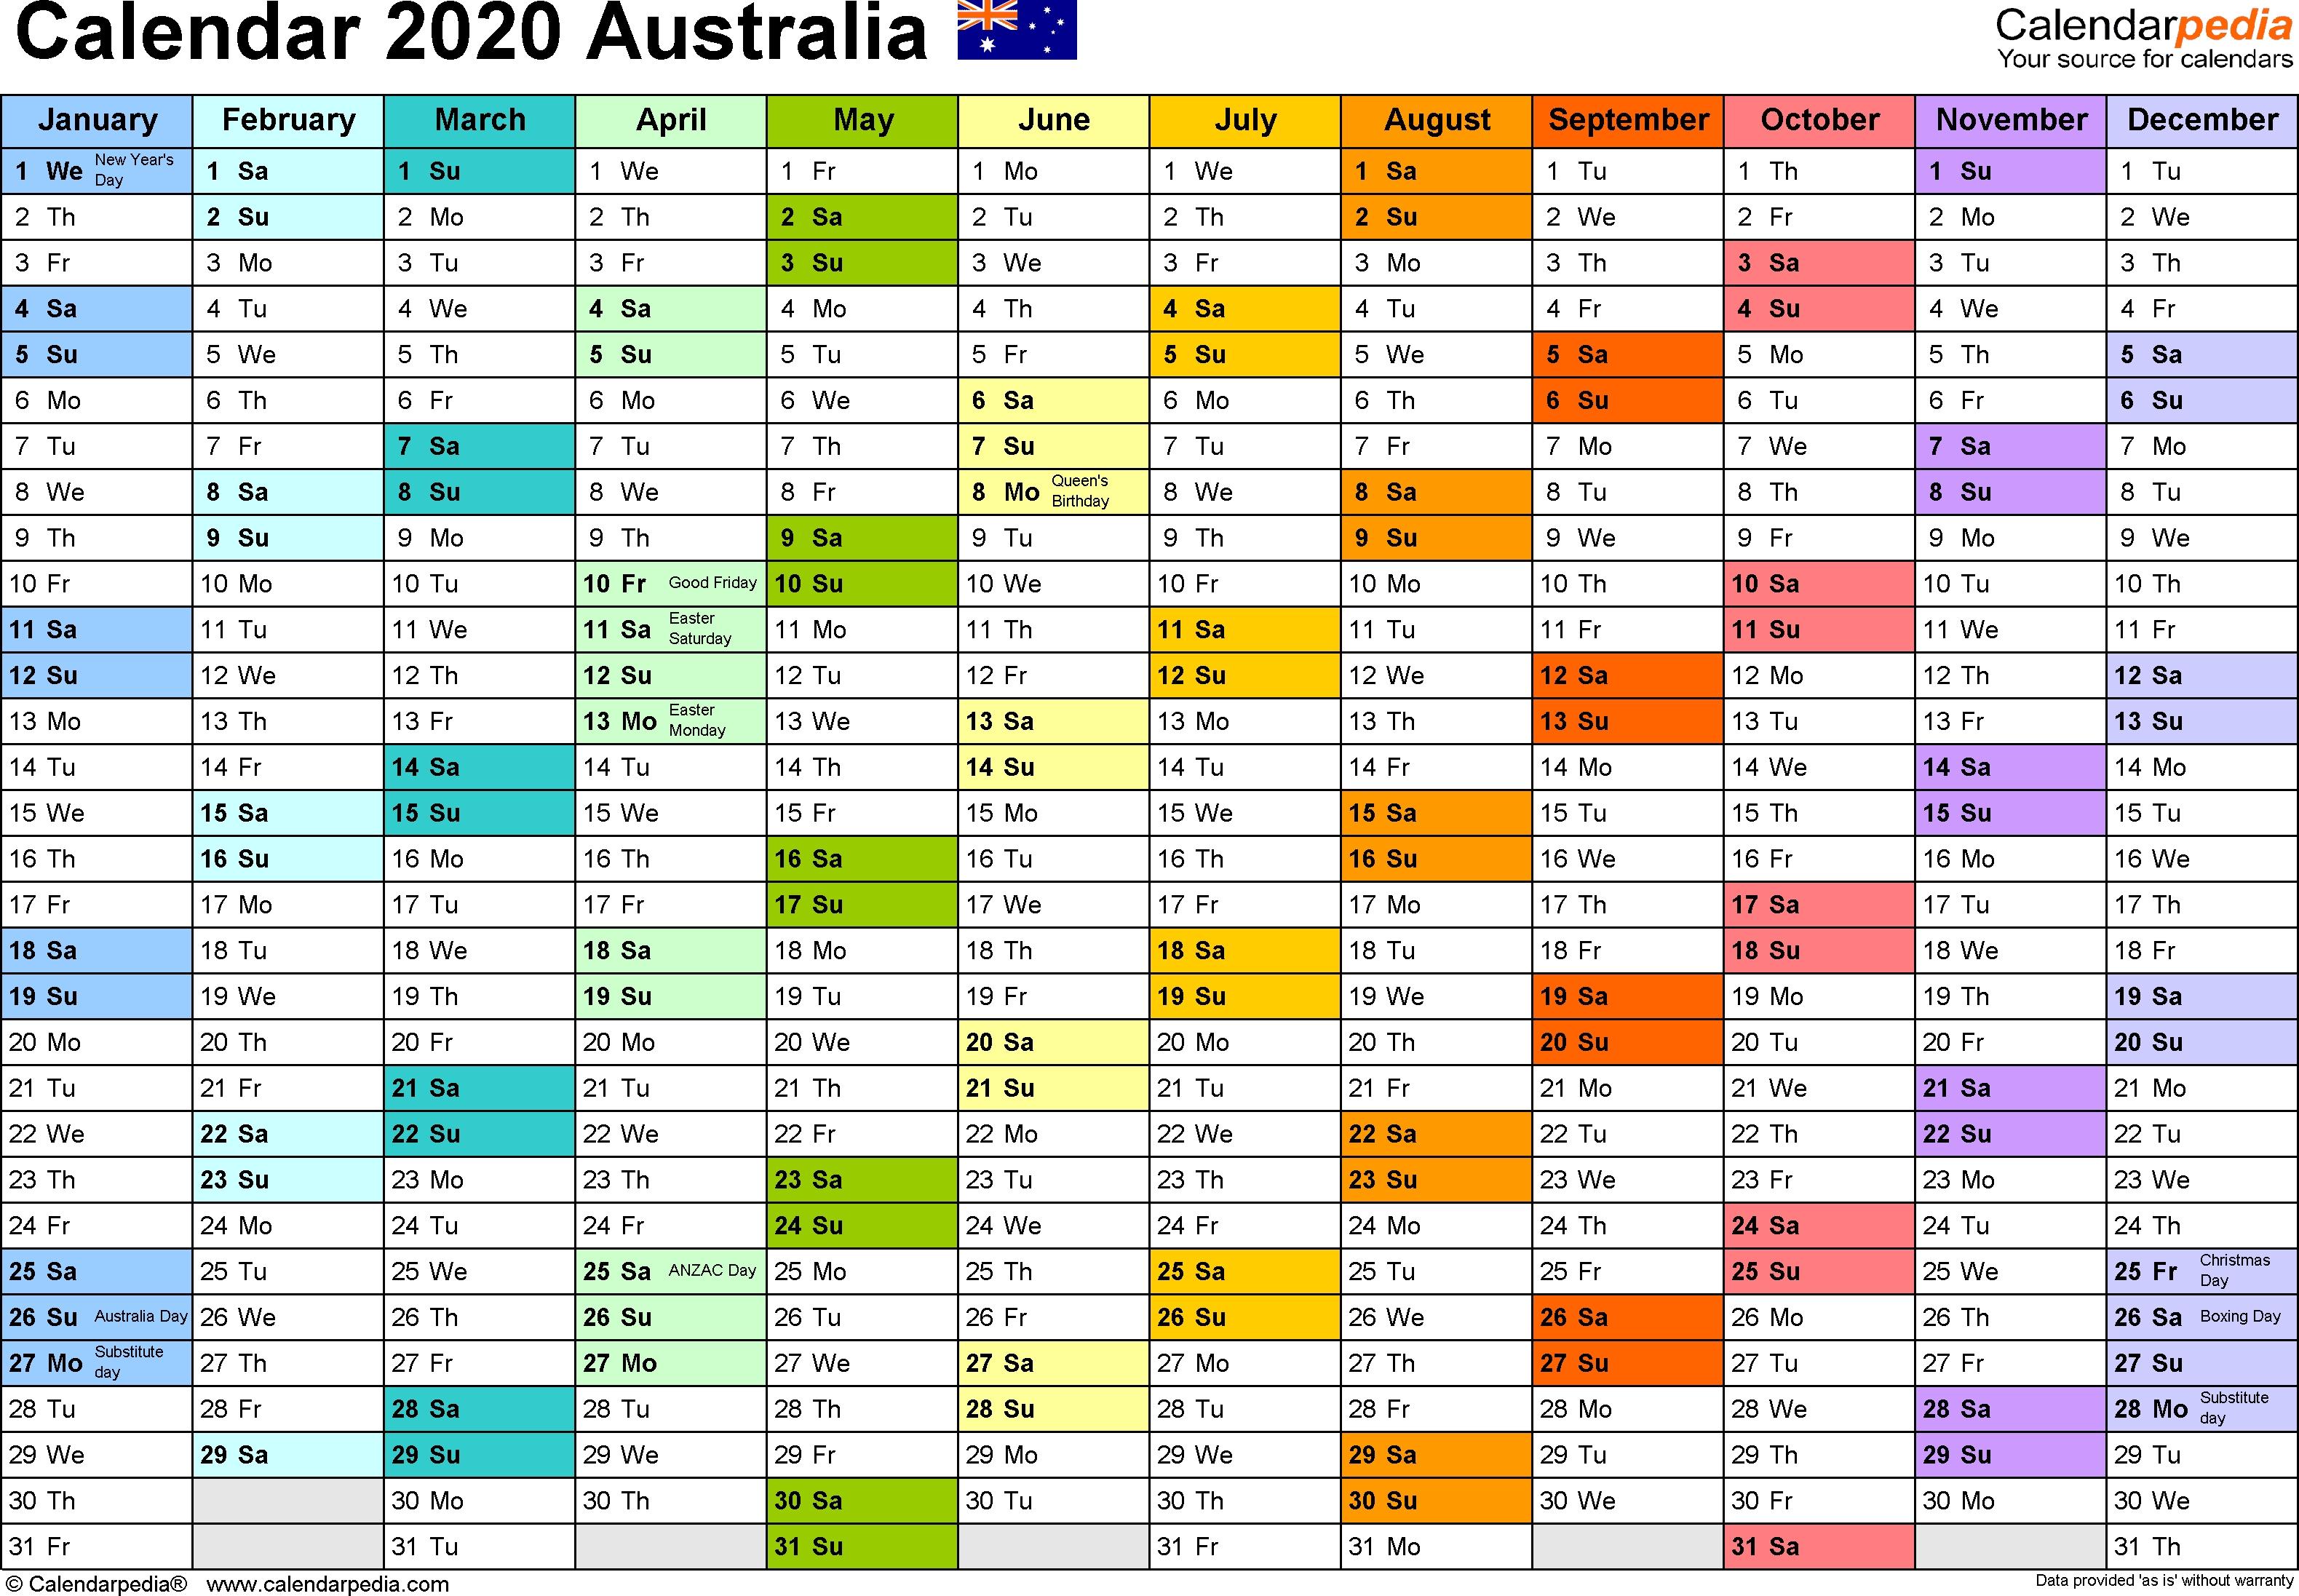 Australia Calendar 2020 - Free Printable Excel Templates  Financial Year 2020 Australia Dates